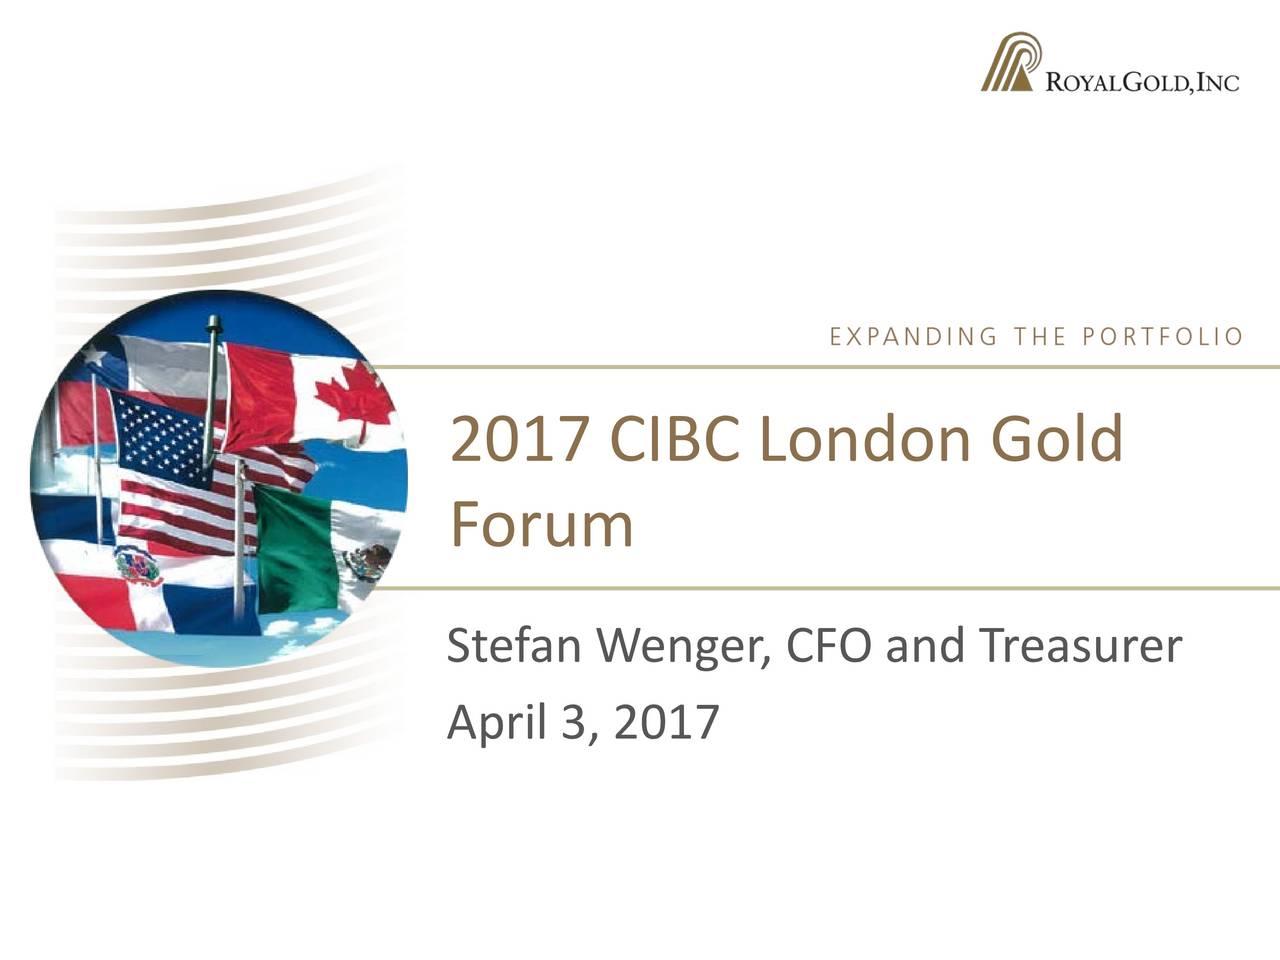 Royal Gold (RGLD) Presents 2017 CIBC London Gold Forum